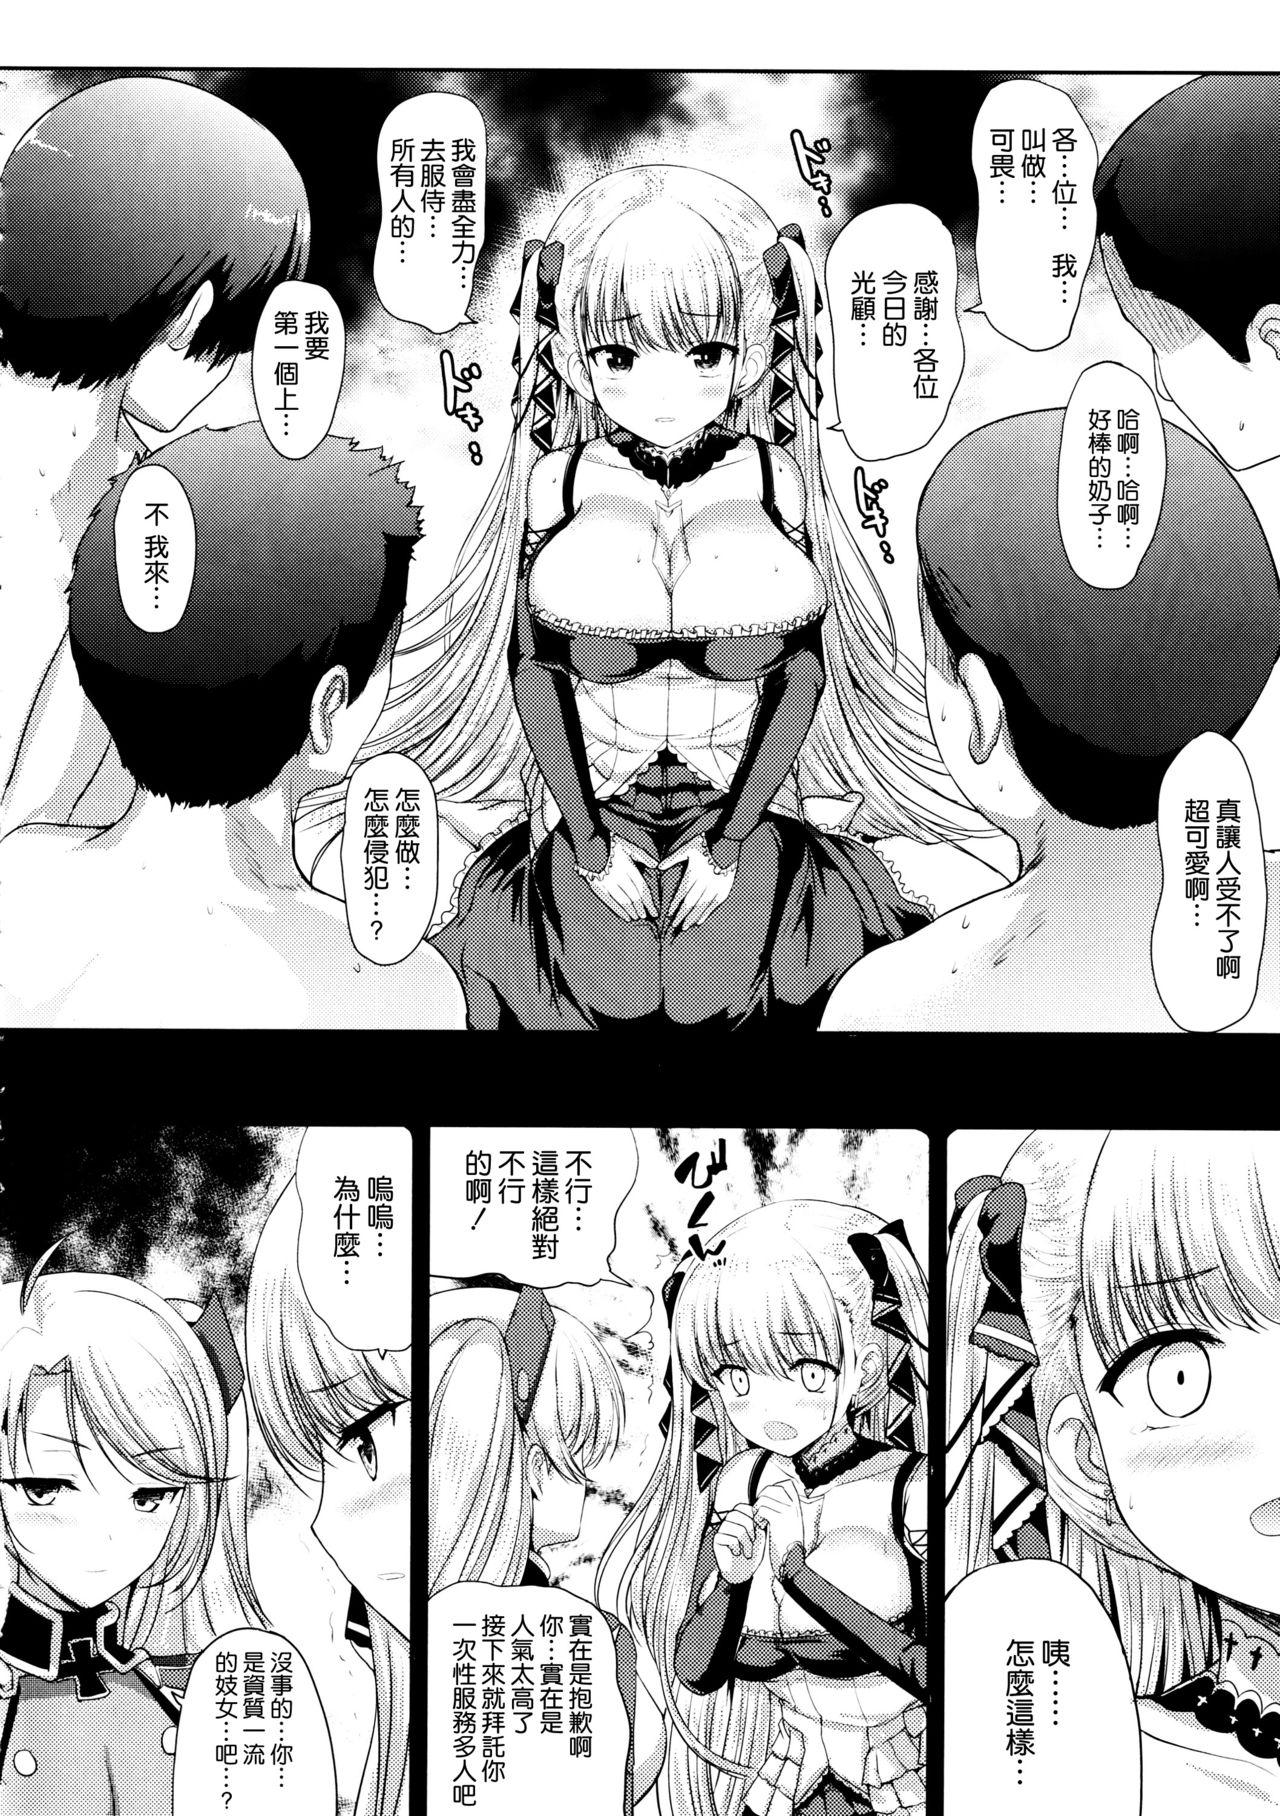 Formidable no Oppai ga Momitakute Shikataganai 23